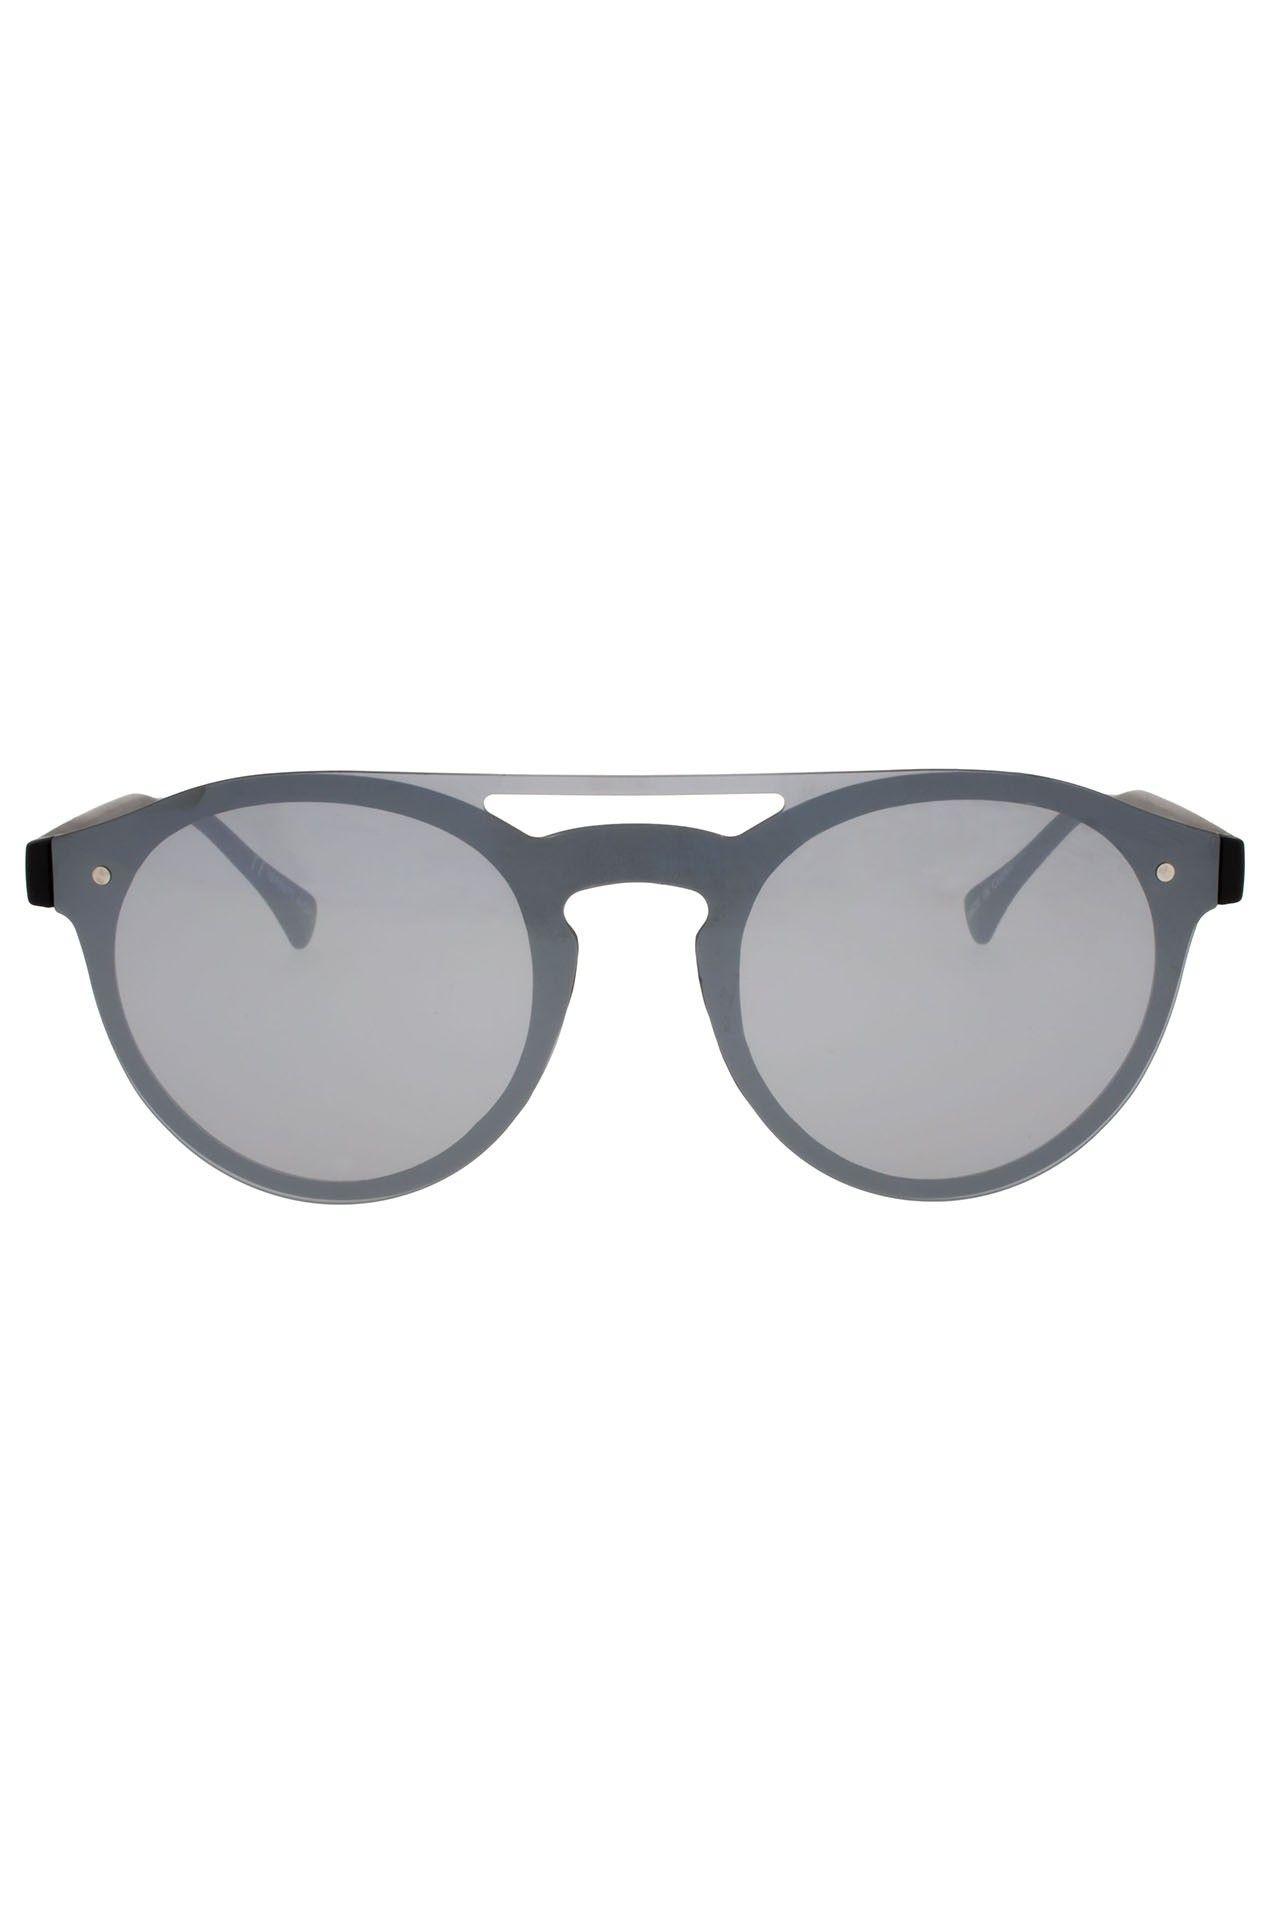 Afbeelding van Icon Eyewear 16P8571 A; Matt Black / Silver Mirror